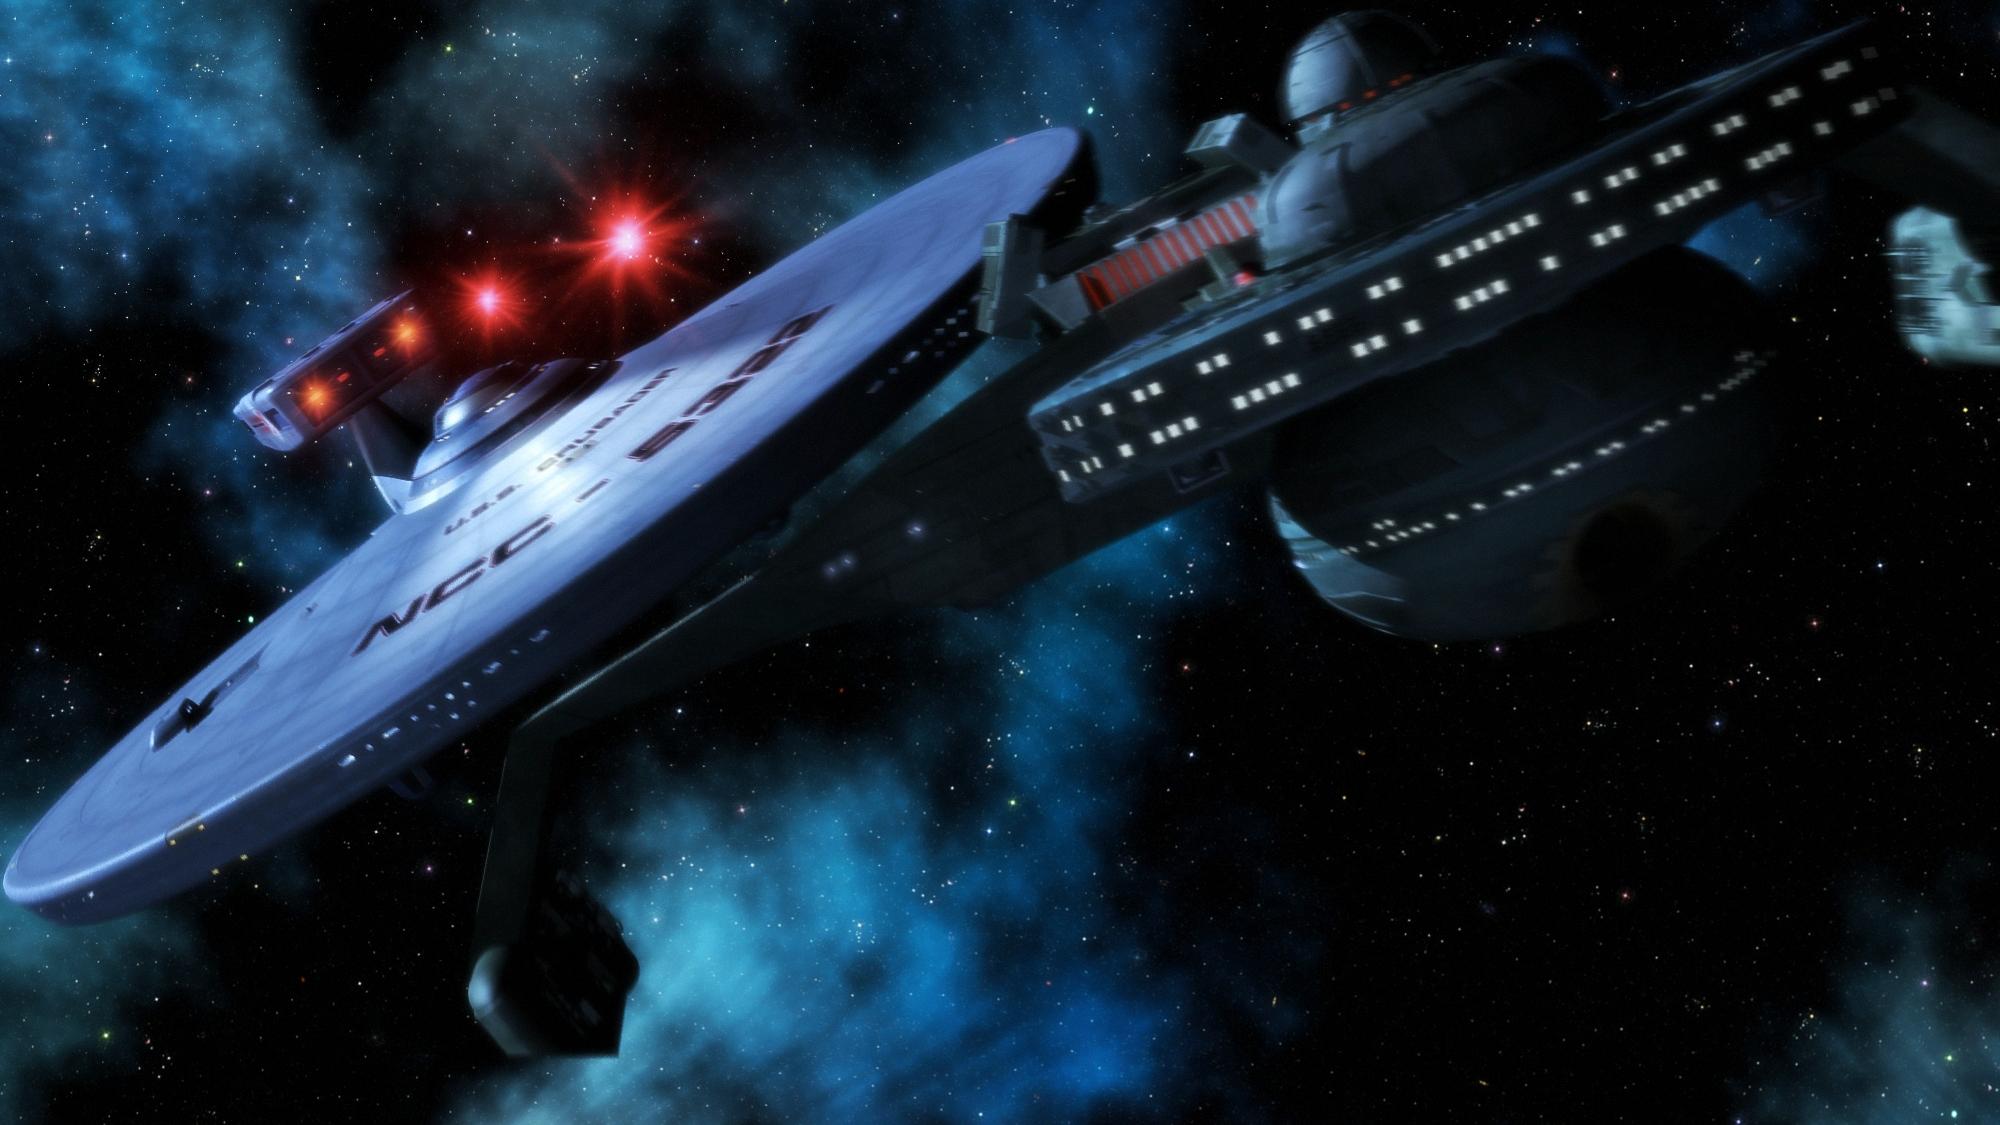 Starfleet Chaplain Iphone 2000x1125